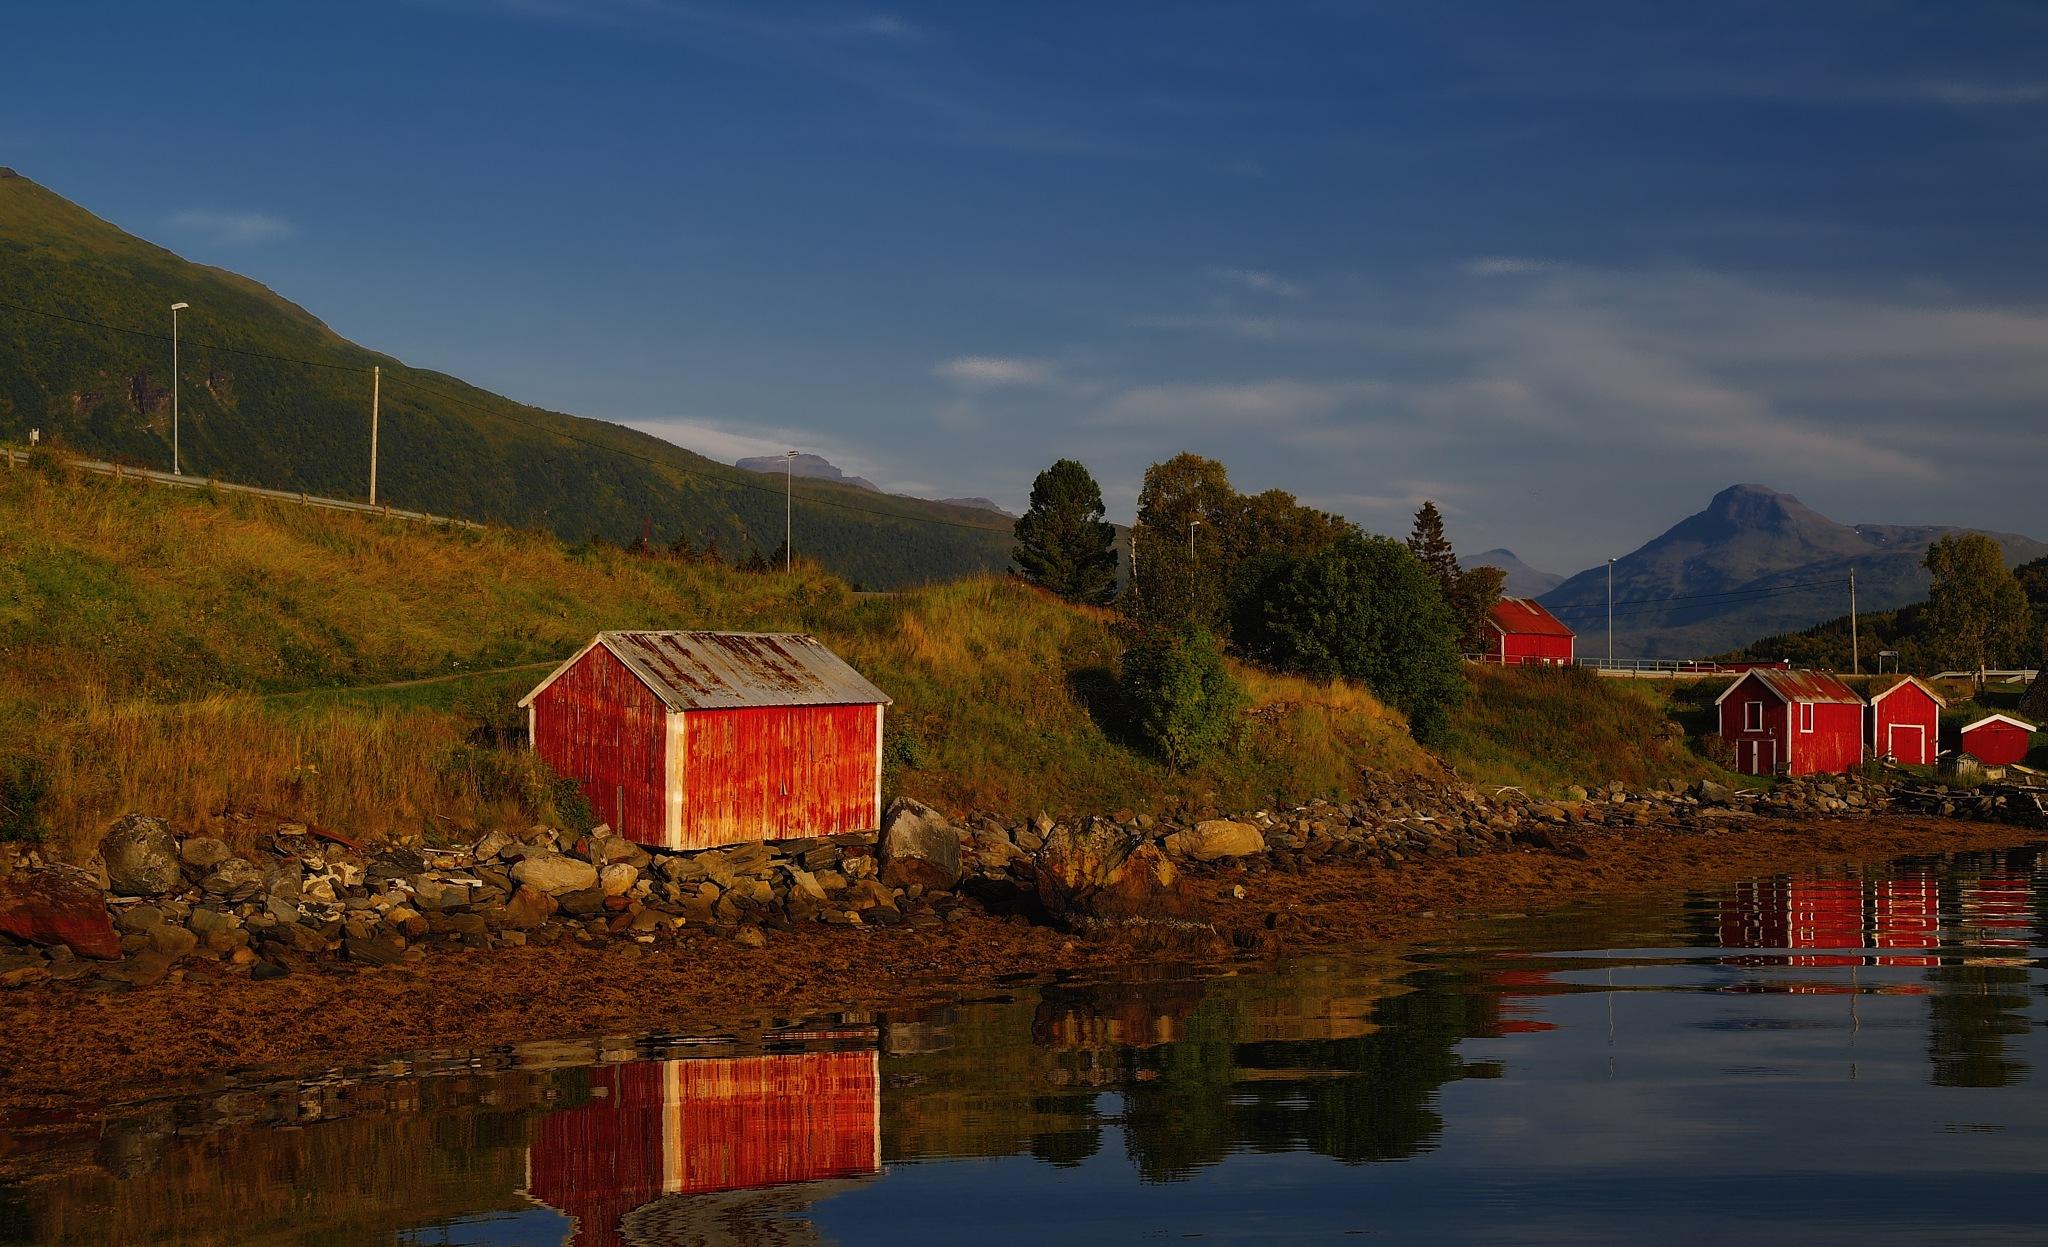 Evening shade by John Frost-bite Slettjord